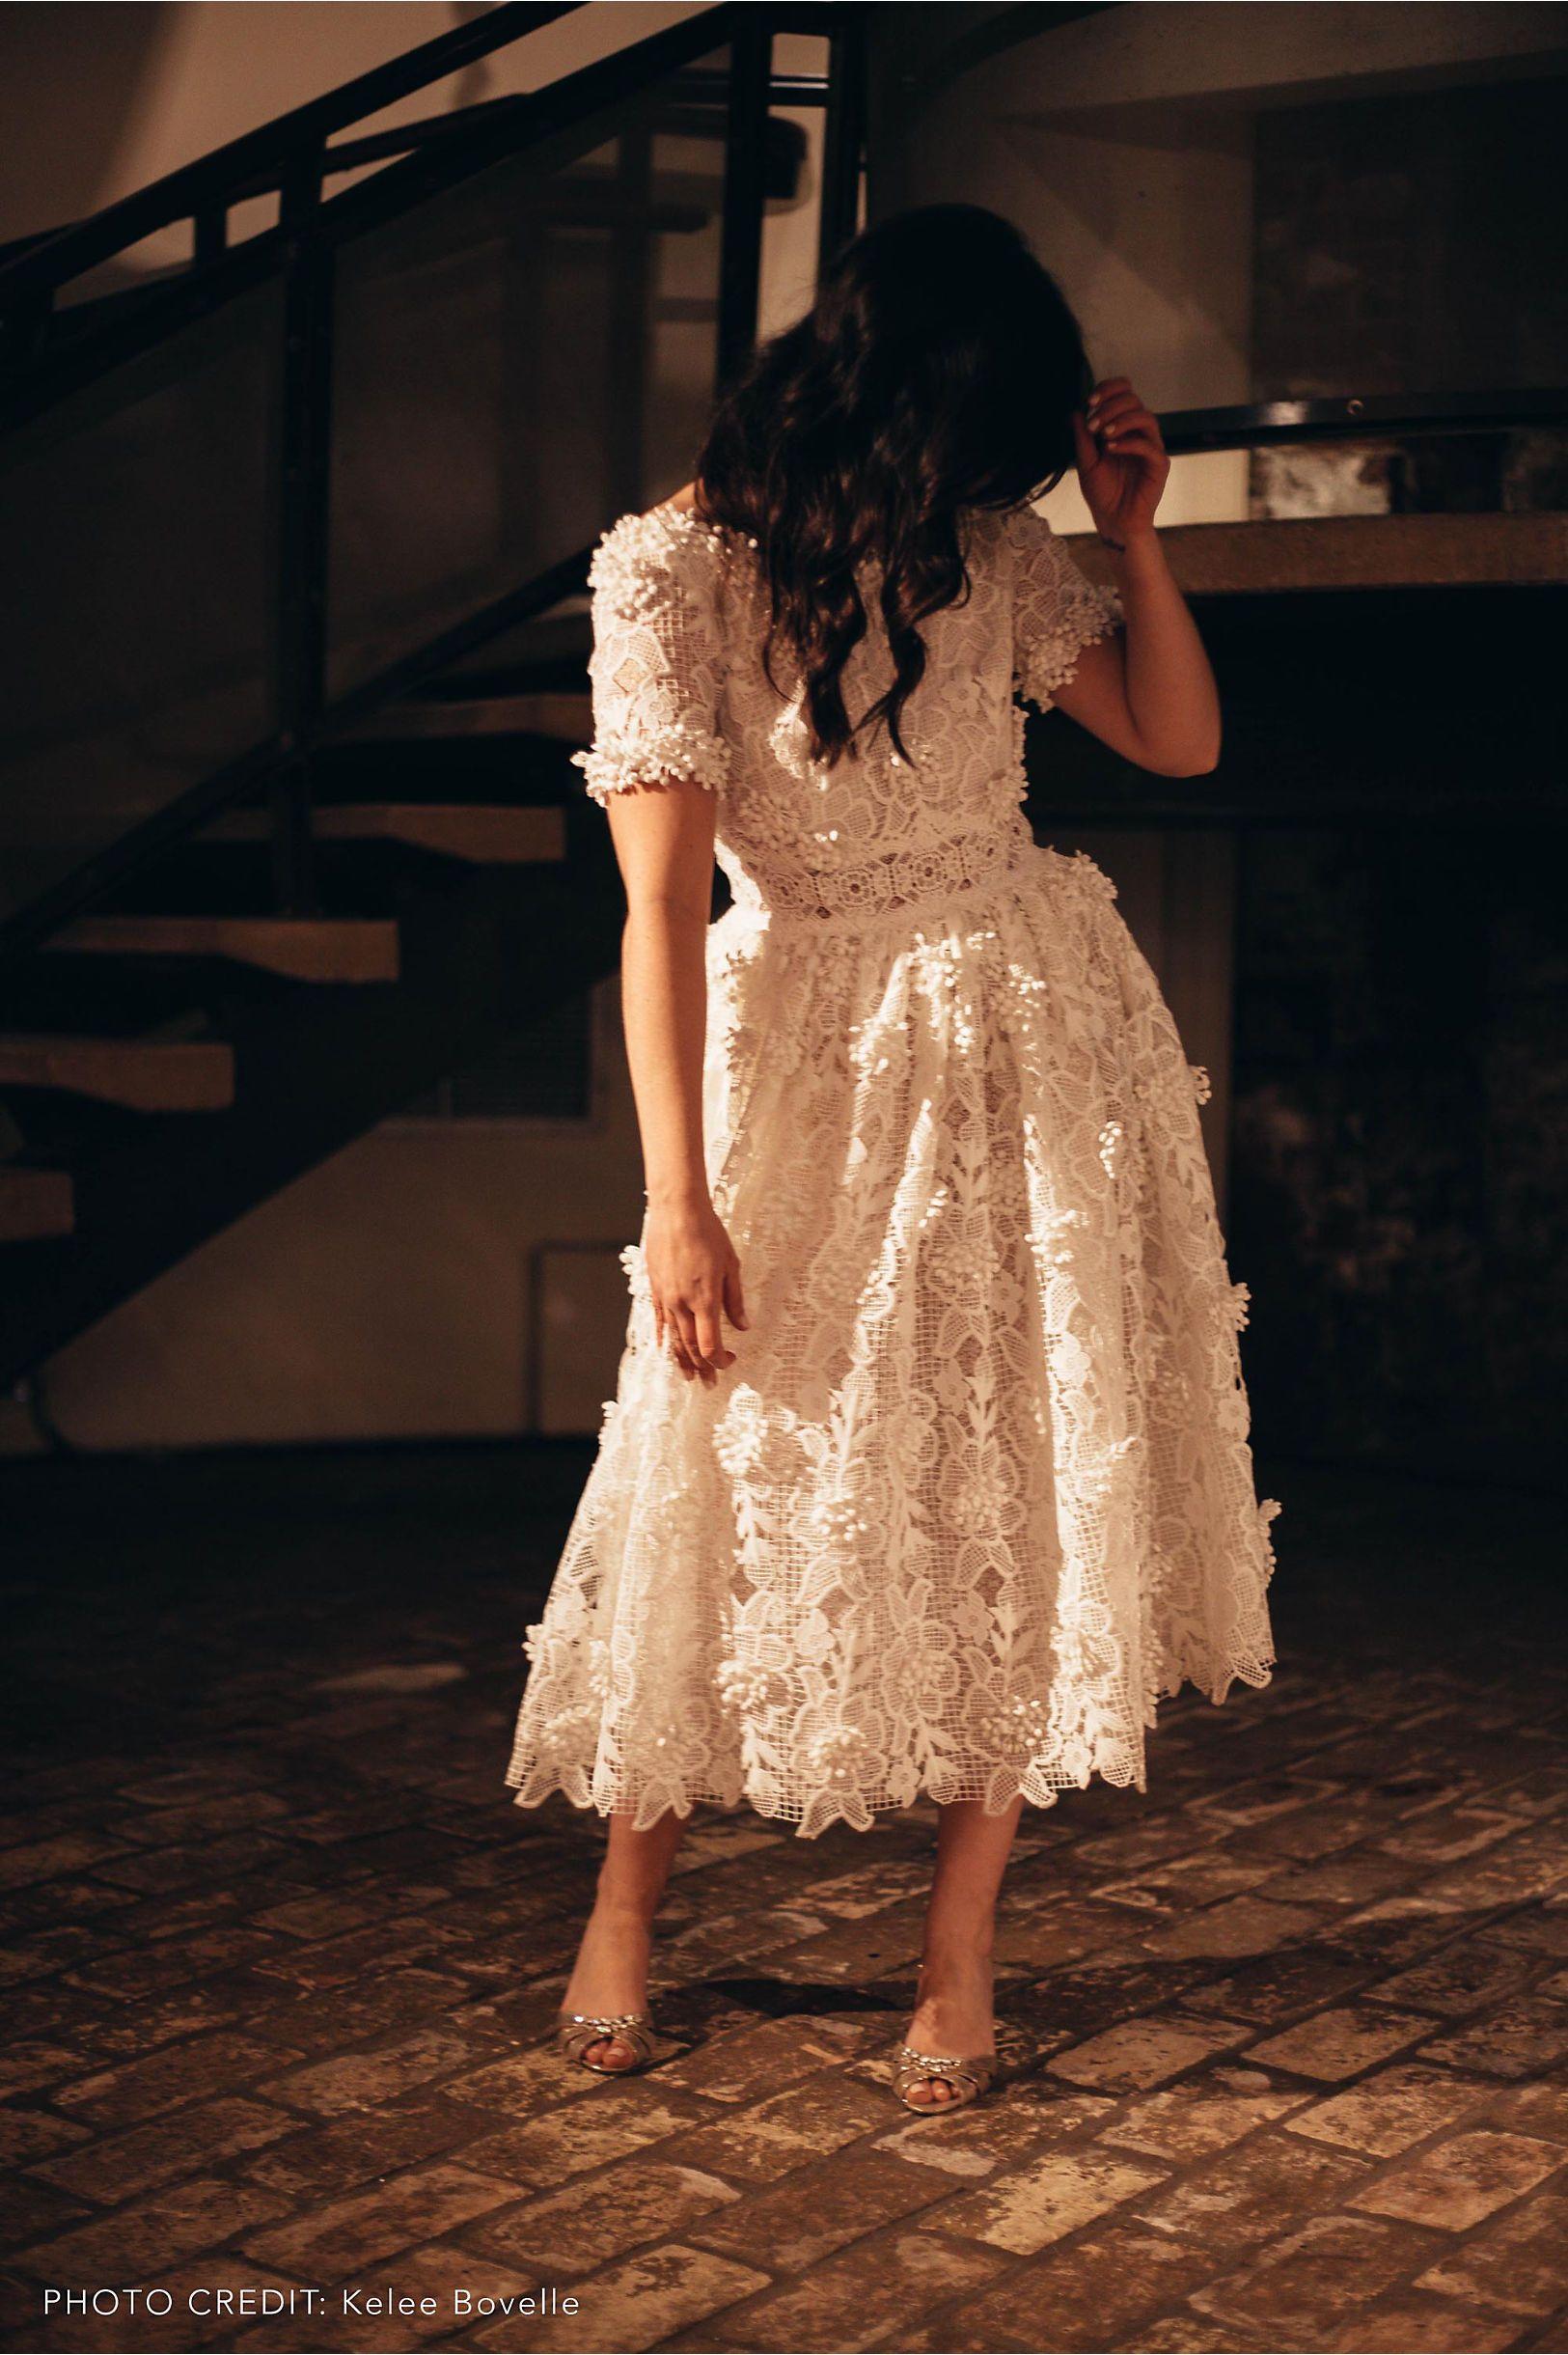 Rehearsal Dinner Or Garden Party Wedding Dixon Gown Ivory In Bride Bhldn Short Wedding Gowns Rehearsal Dinner Dresses Dinner Dress [ 2440 x 1625 Pixel ]